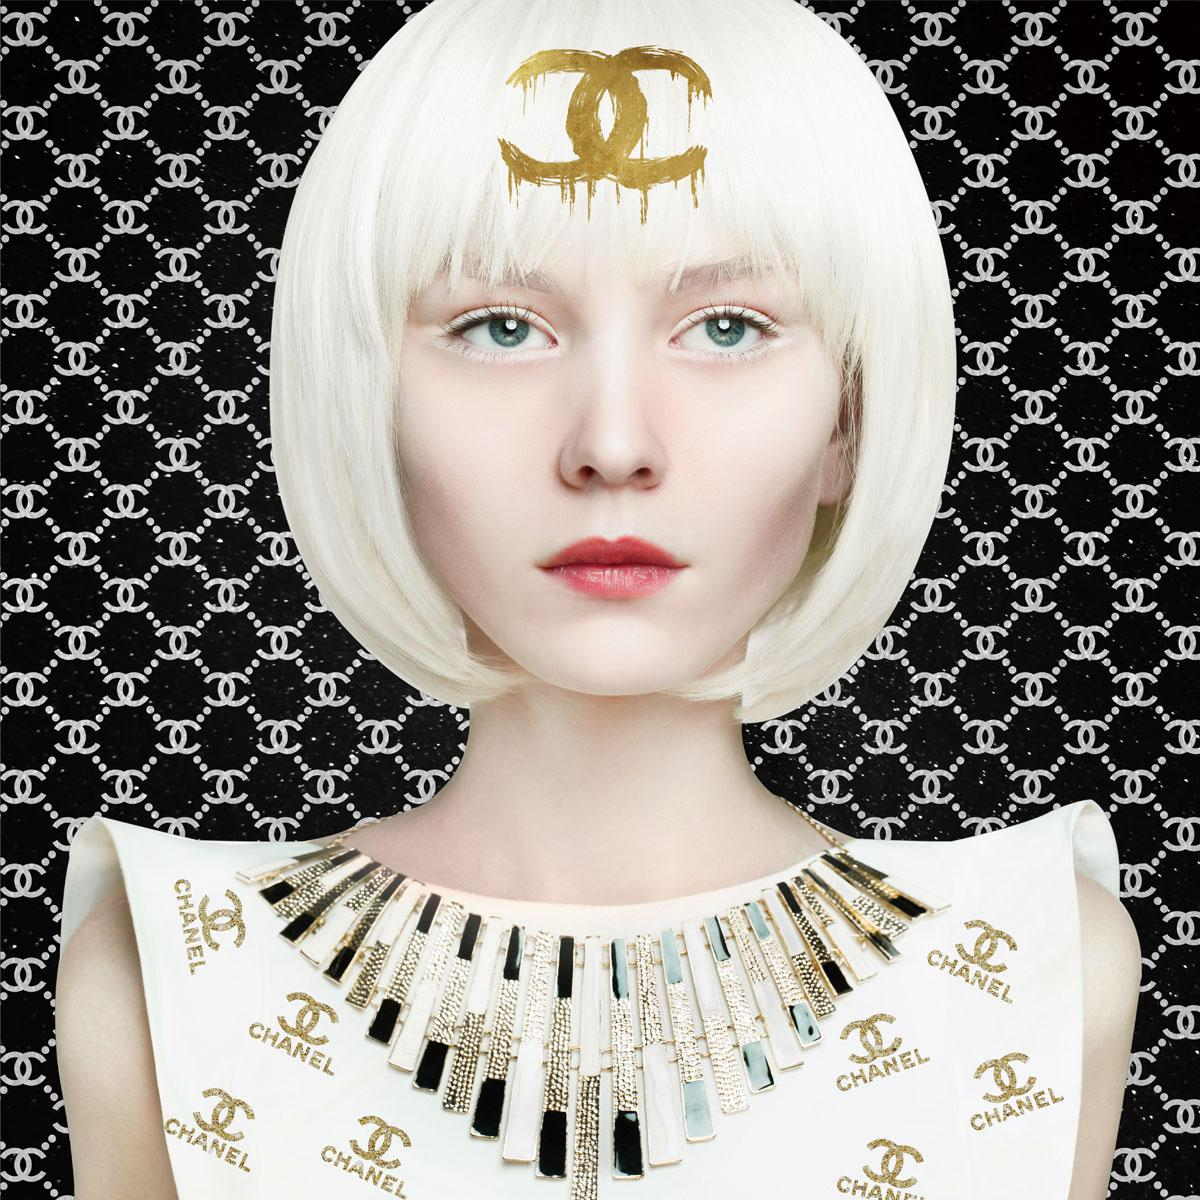 Foto op glas 'Chanel blond hair'